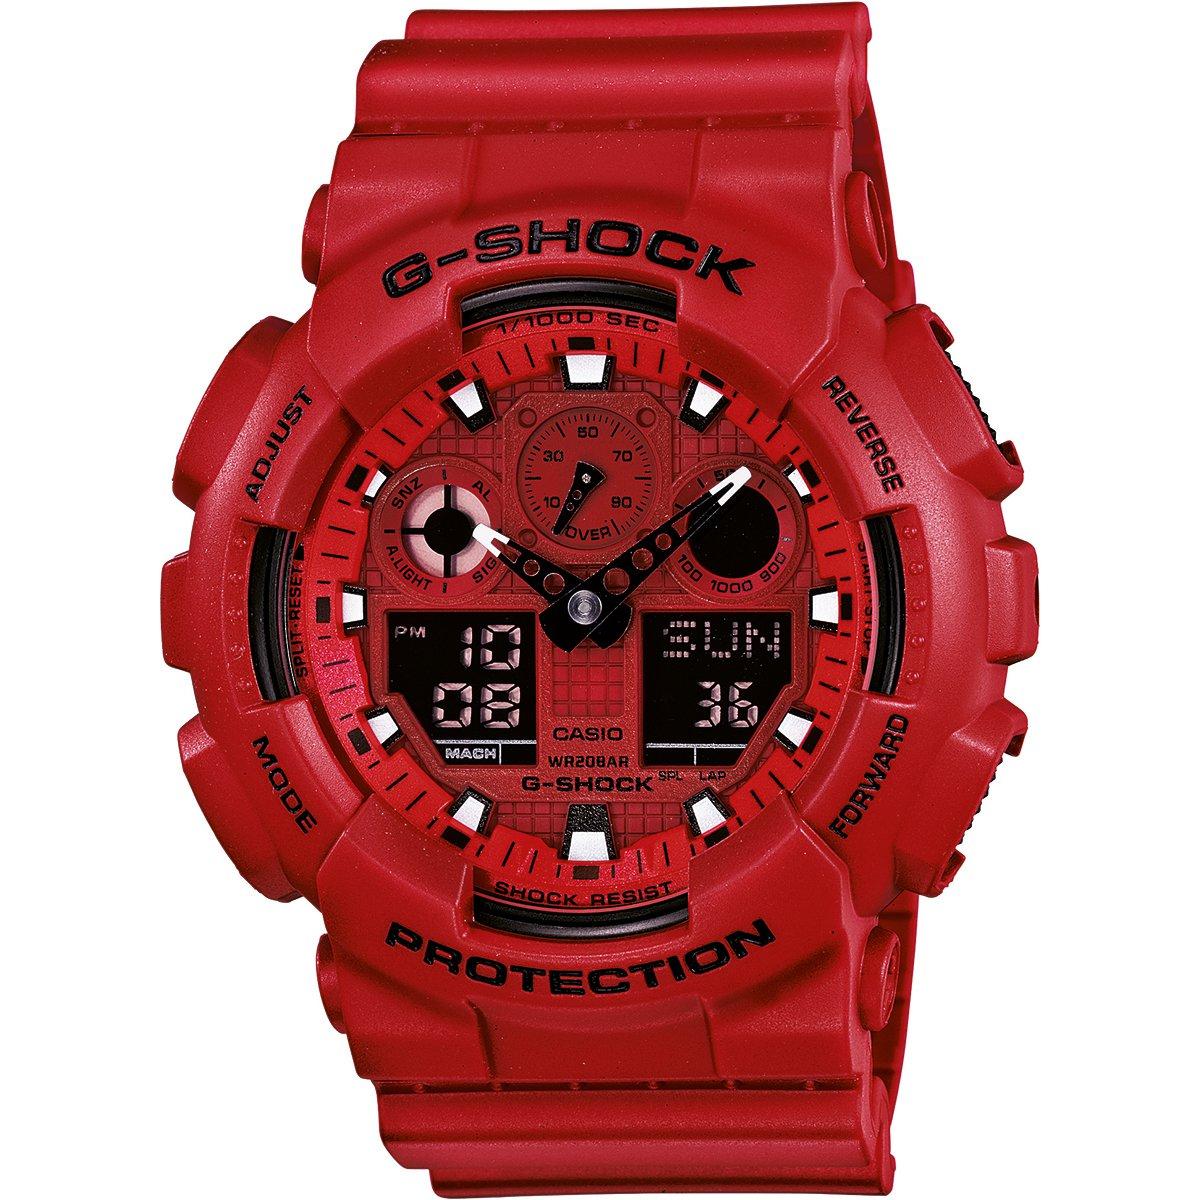 534237babdd Relógio G-Shock Digital - Compre Agora